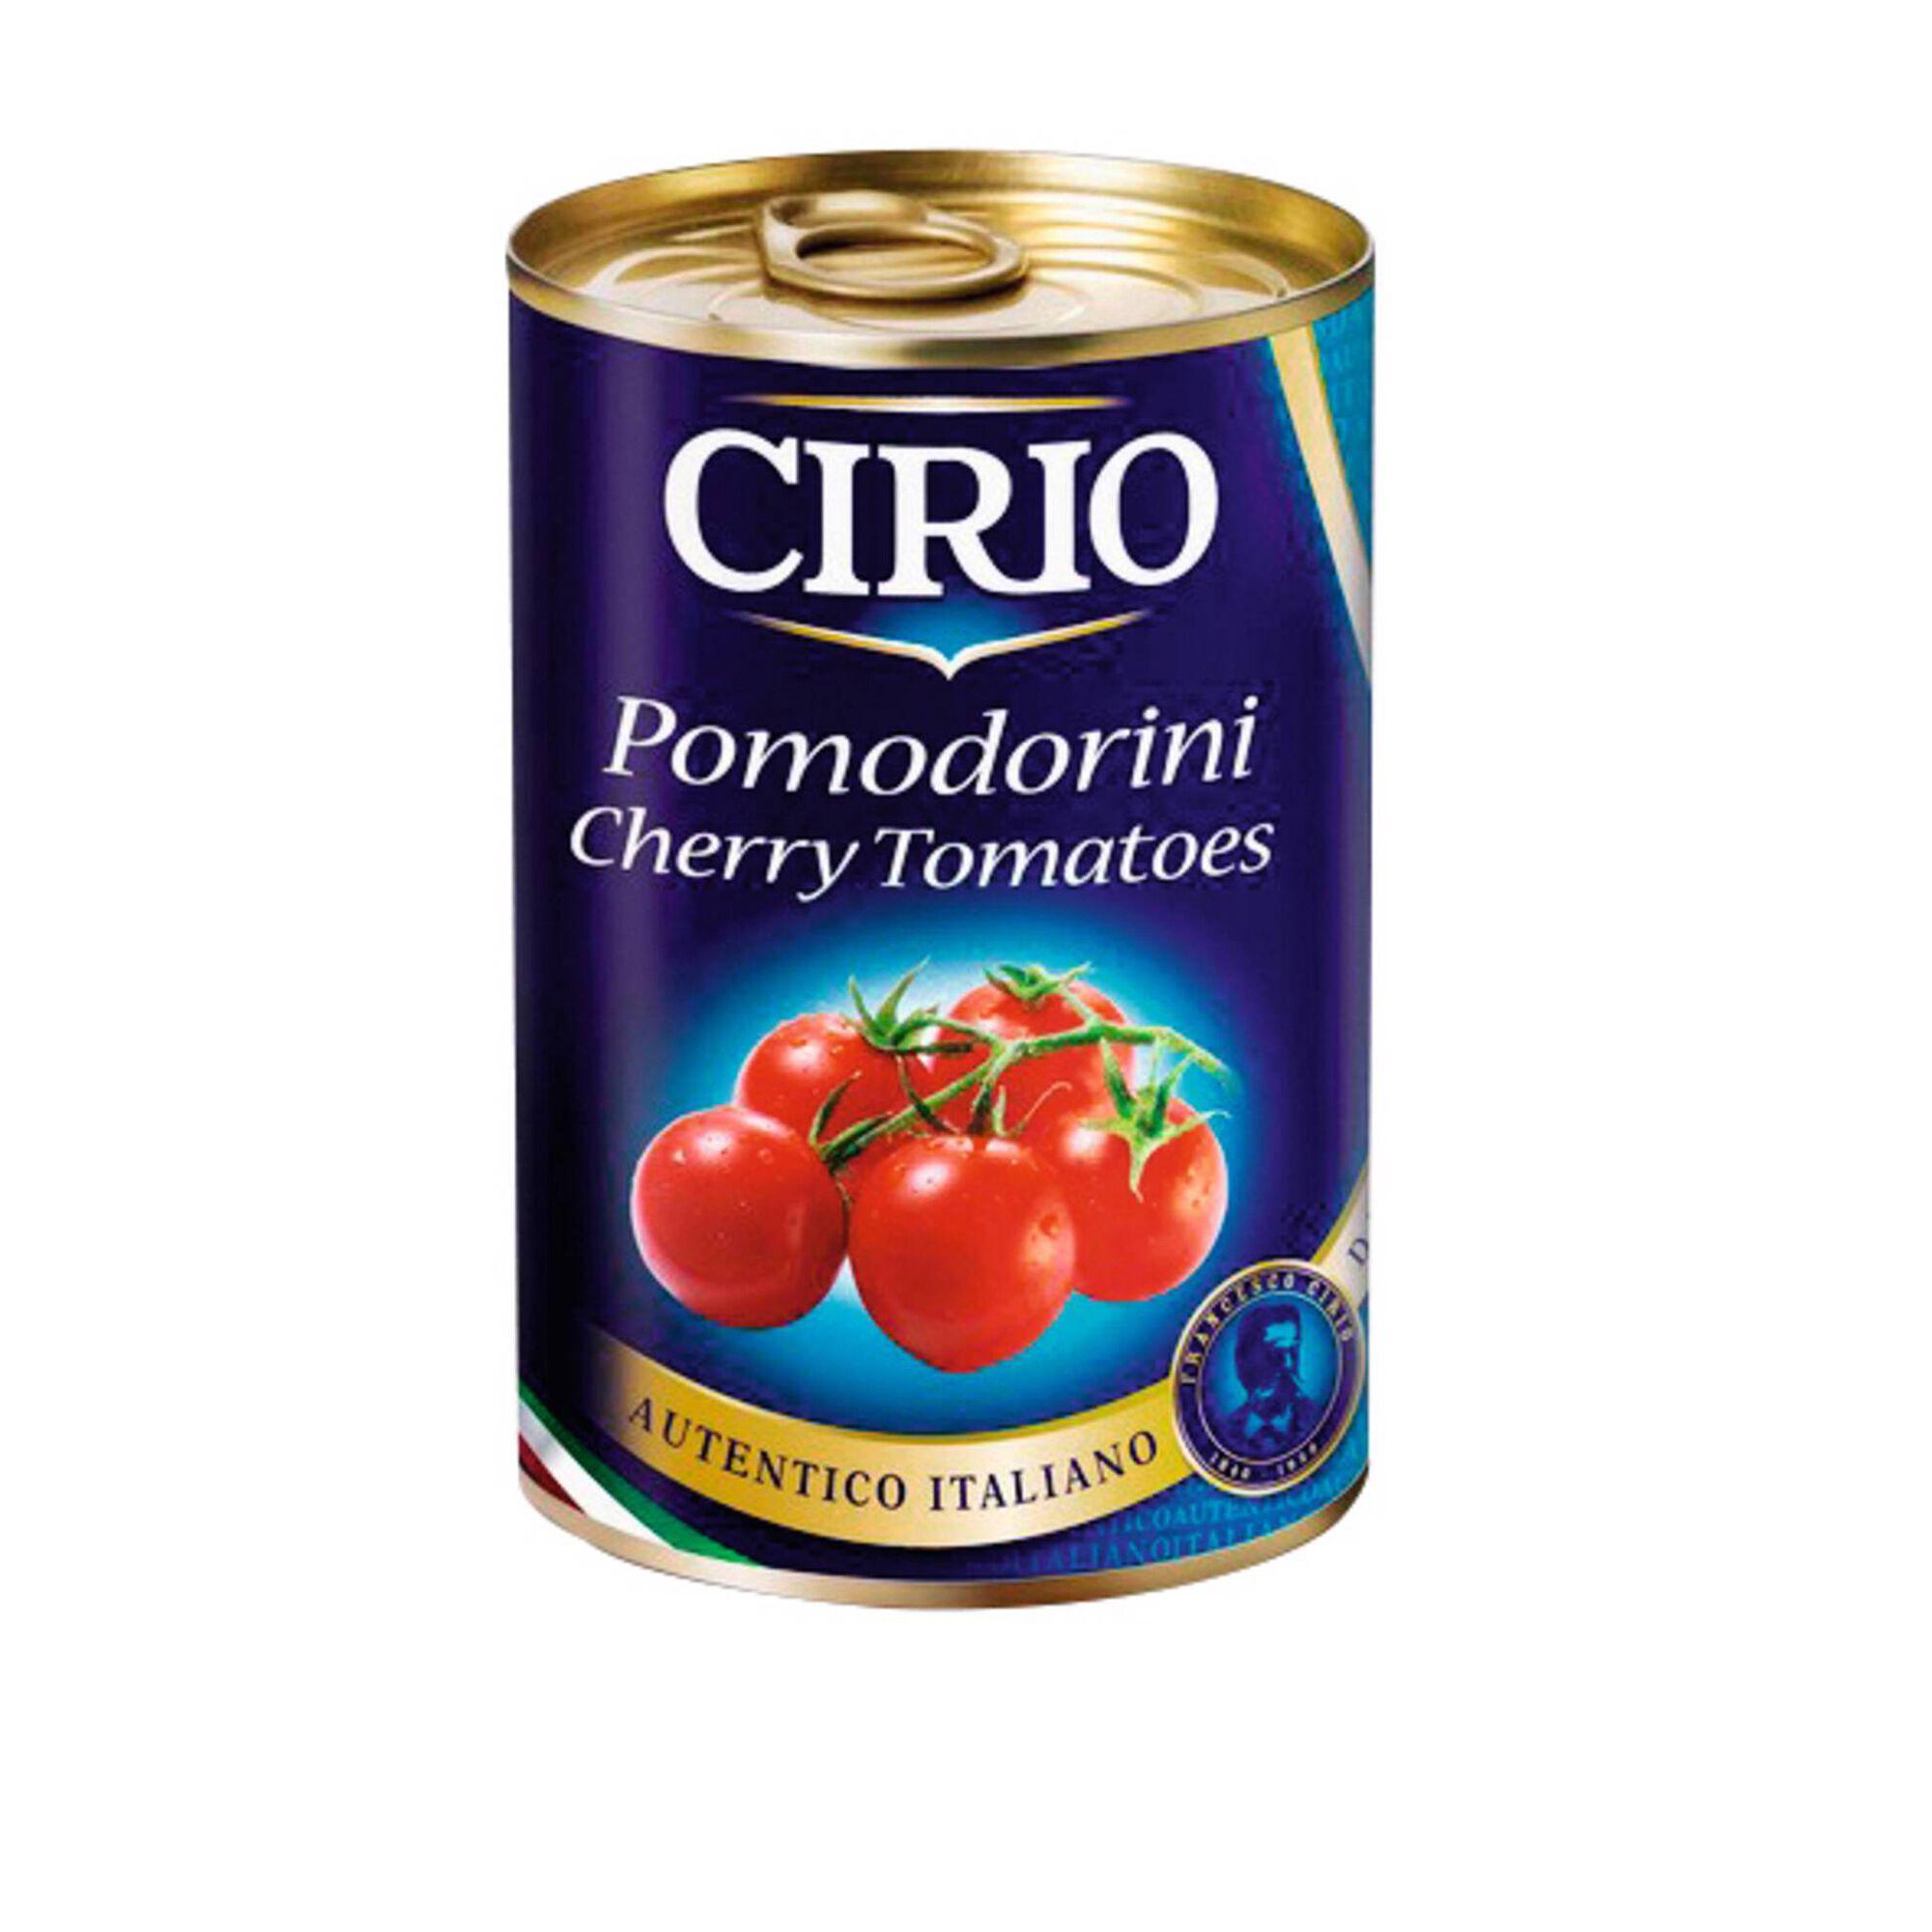 Polpa de Tomate Cherry